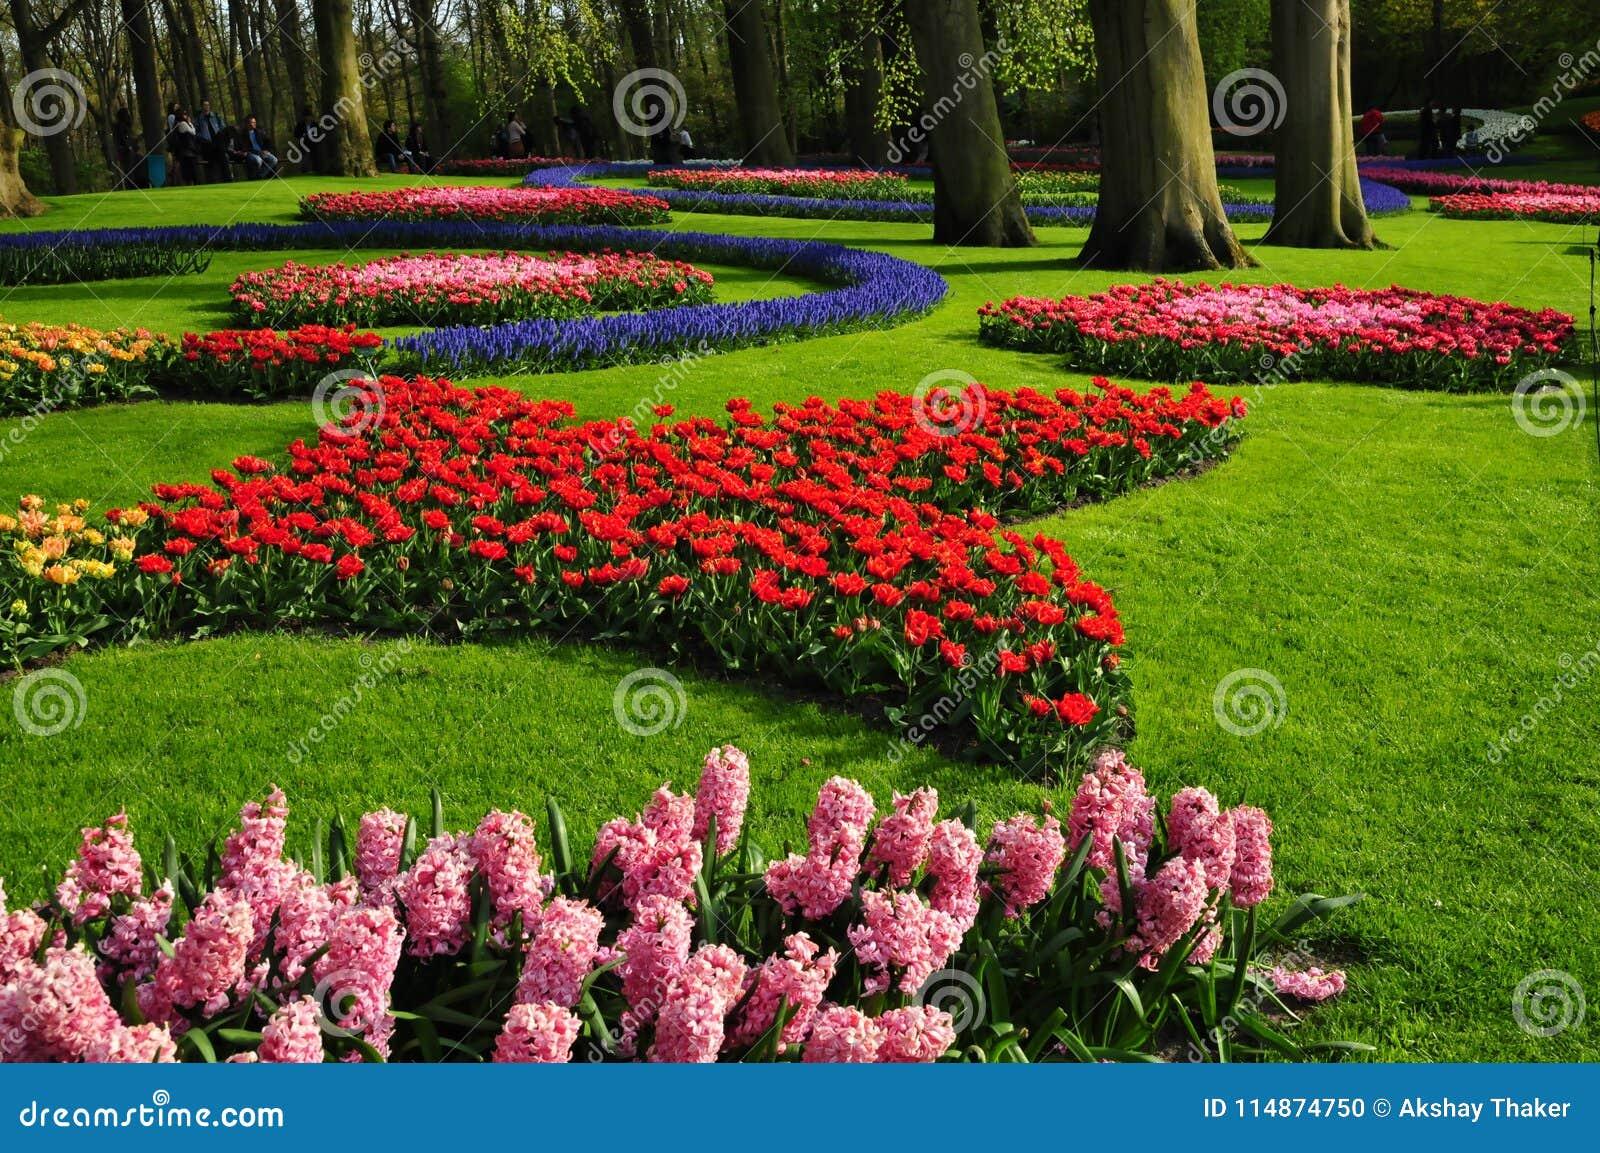 Keukenhof garden the worlds largest flower gardens situated in the worlds largest flower gardens situated in lisse netherlands izmirmasajfo